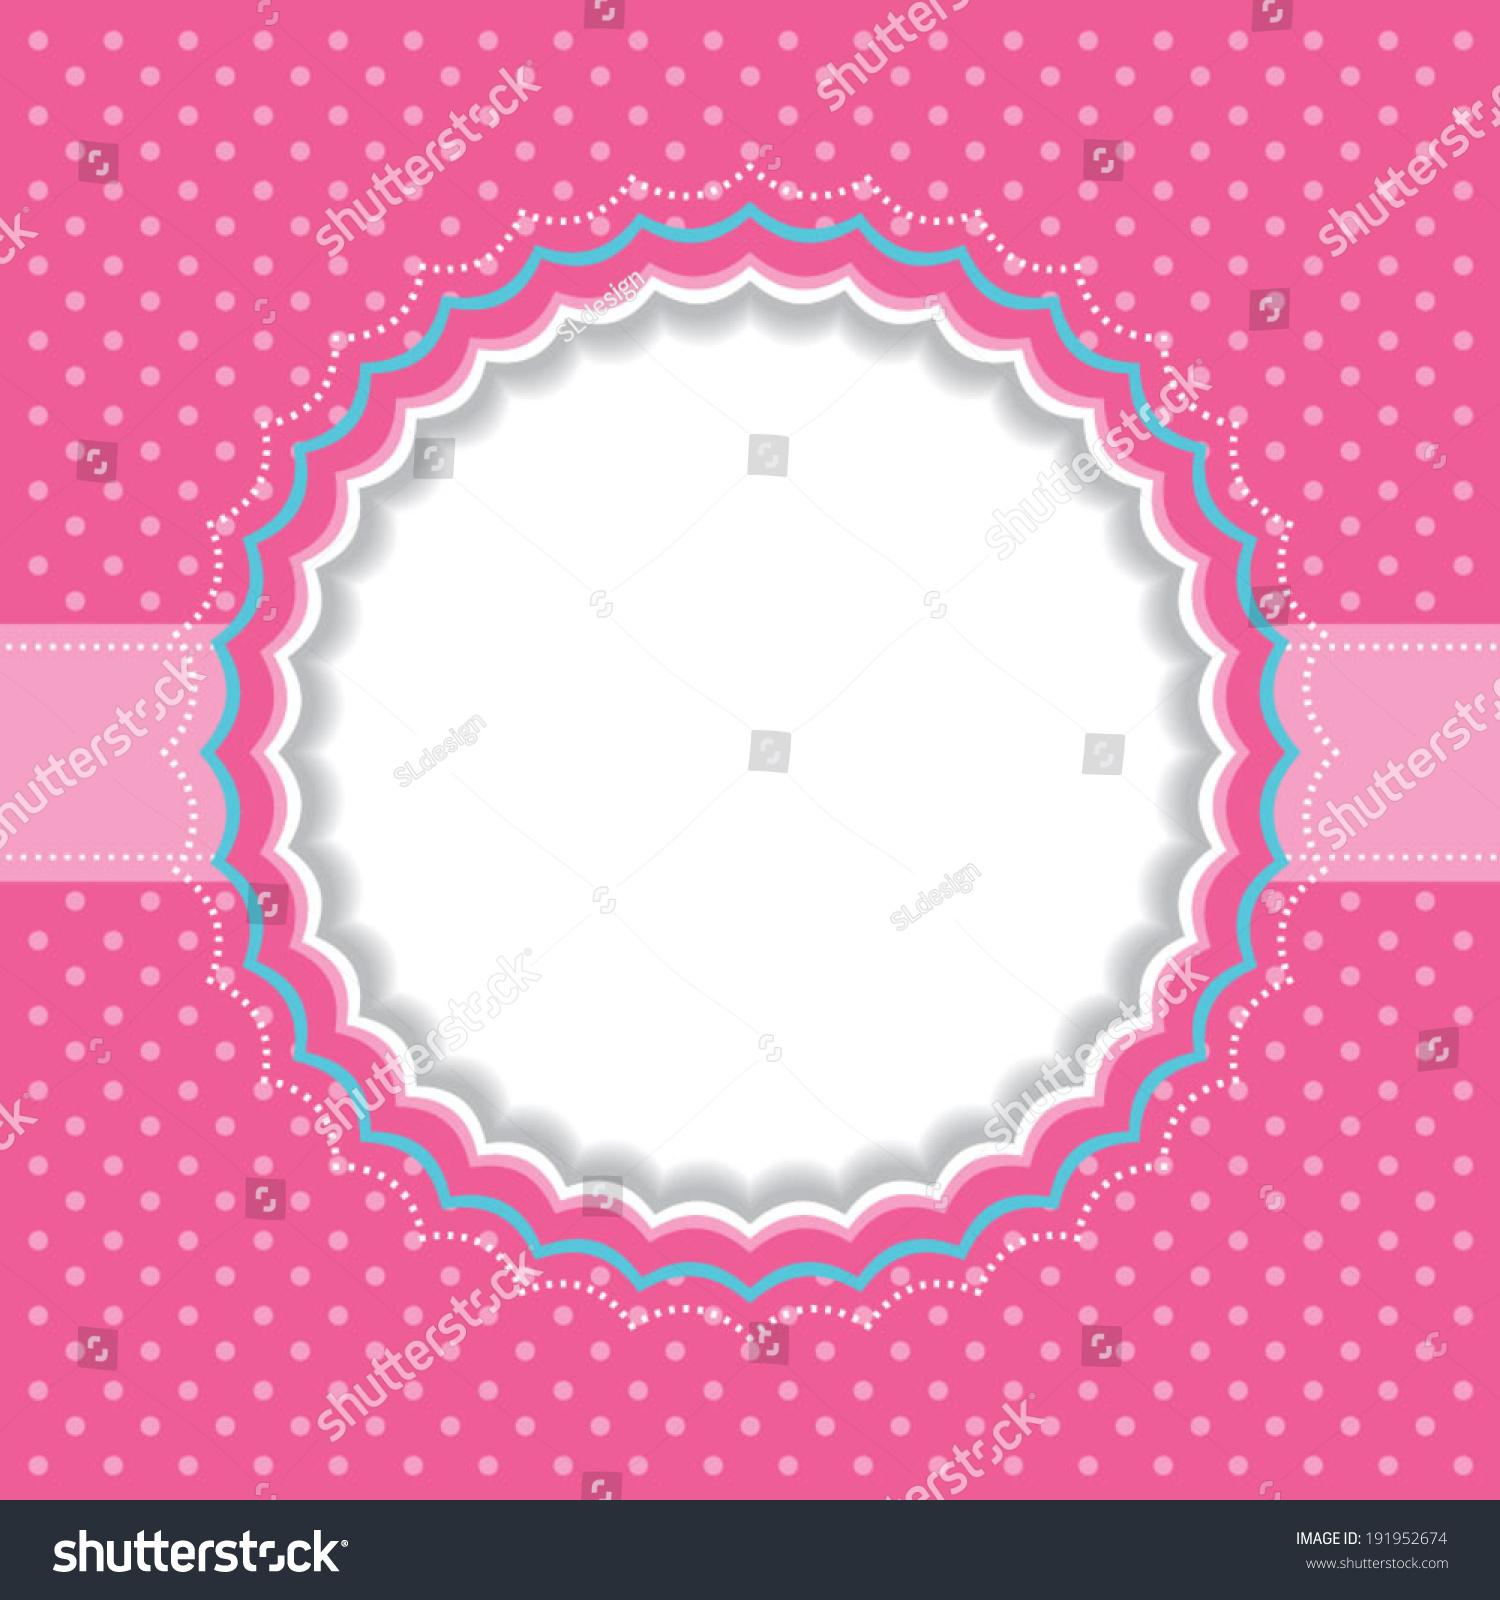 Polka dot frame | EZ Canvas